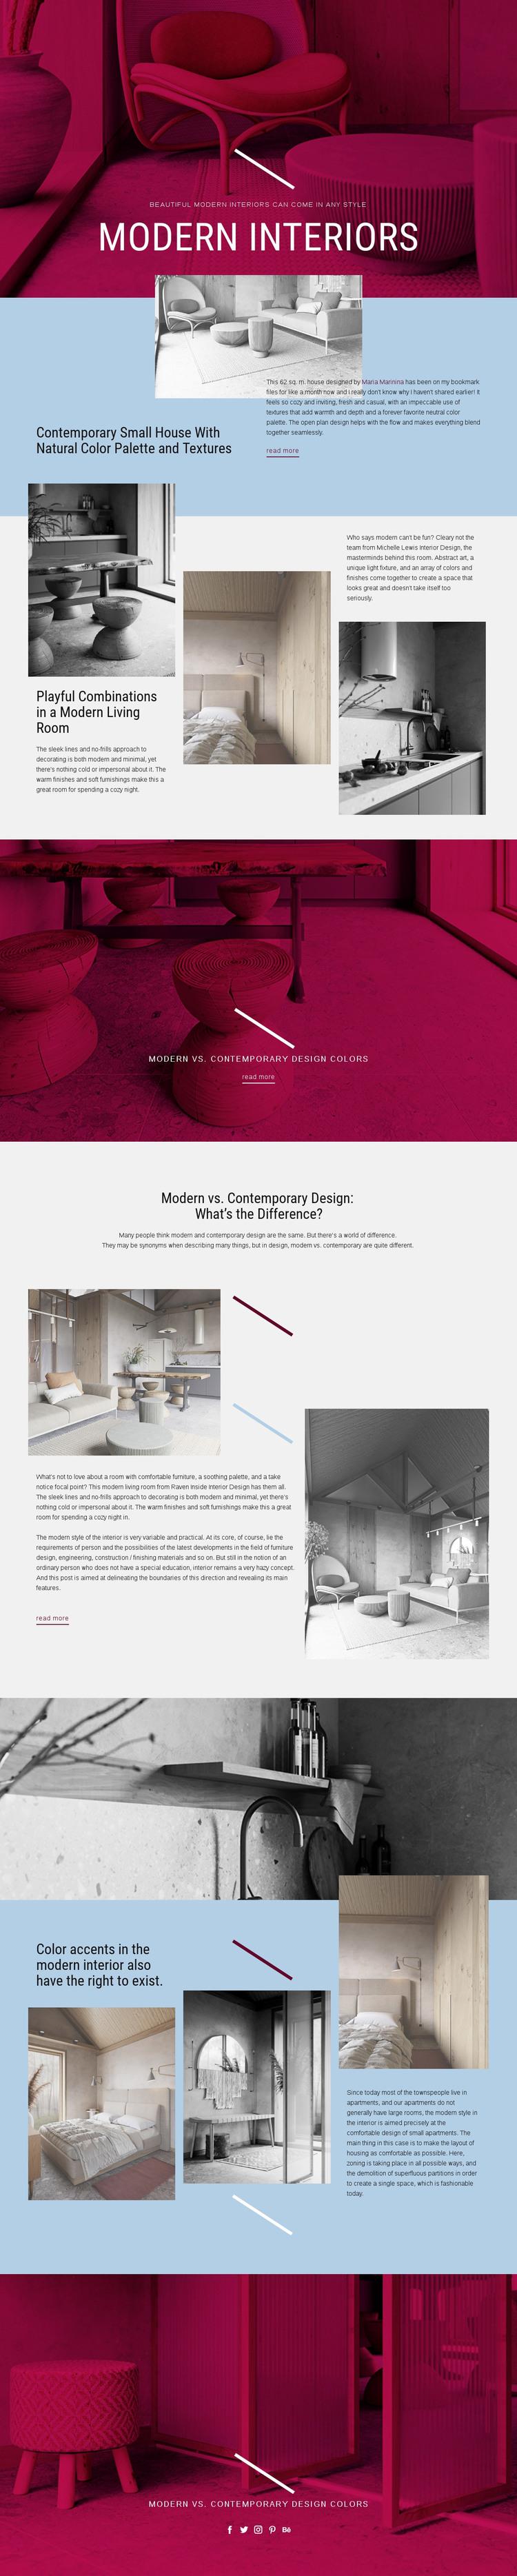 Modern Interiors Web Design